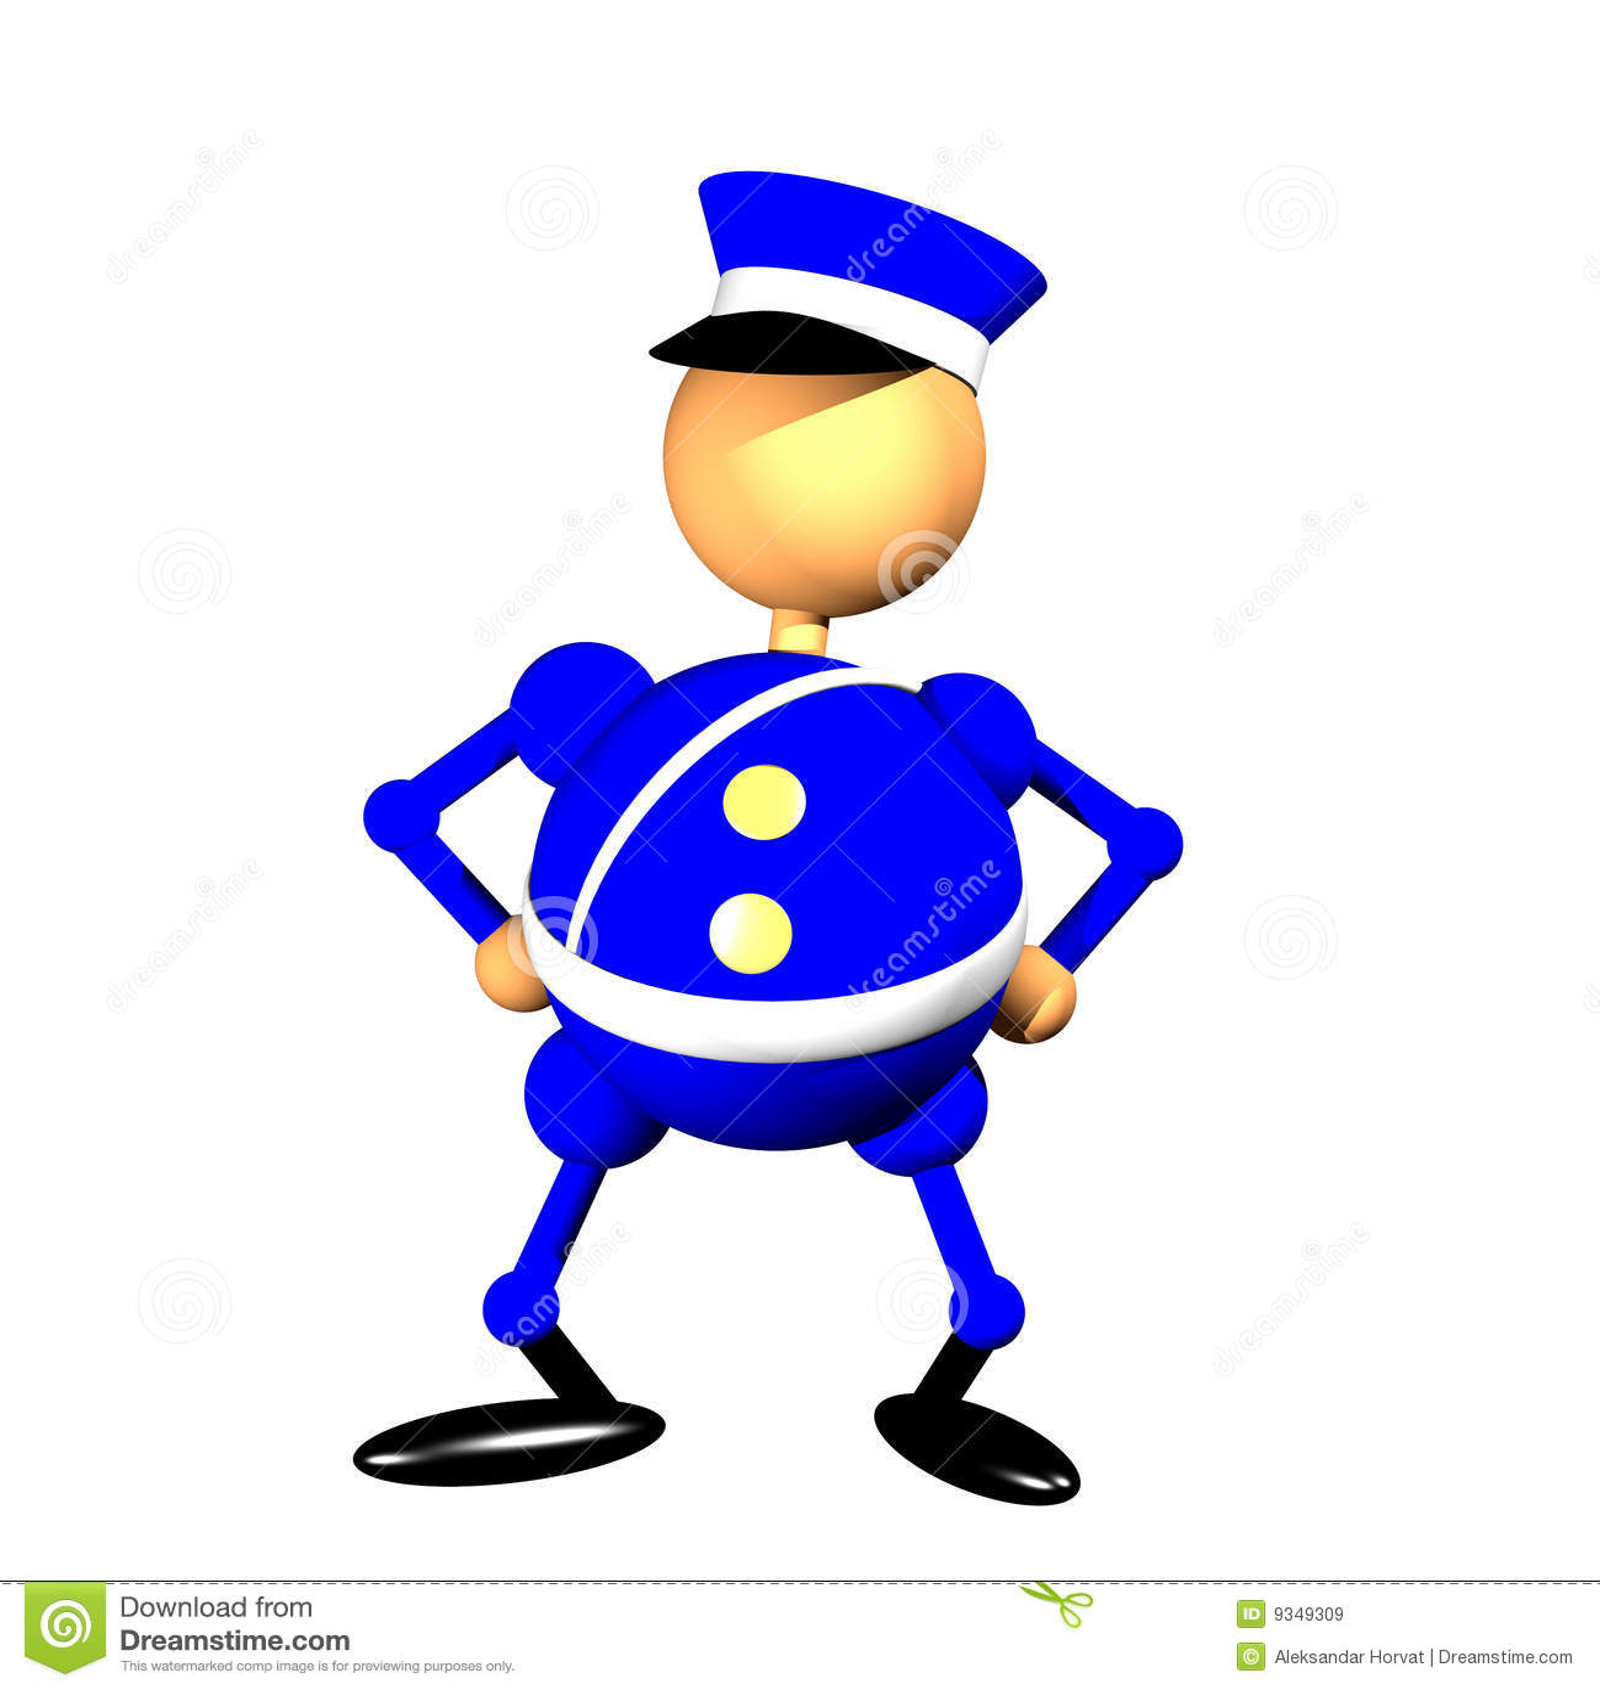 policeman clipart stock illustration illustration of occupation rh dreamstime com clipart policeman badges clipart police star badges